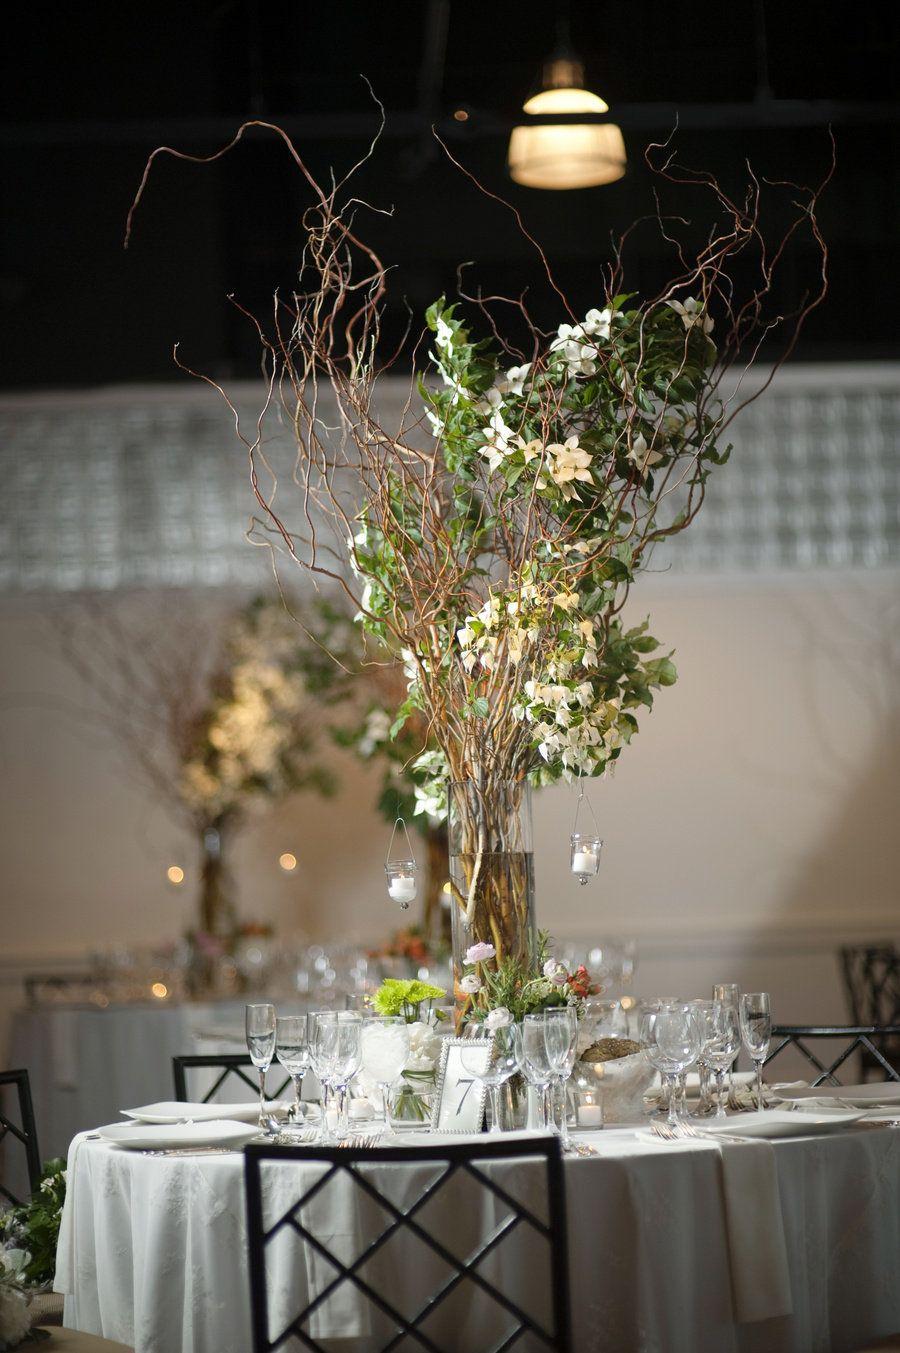 Wedding decoration ideas centerpieces  Chelsea Piers Wedding by Justin u Mary  Floral designs Weddings